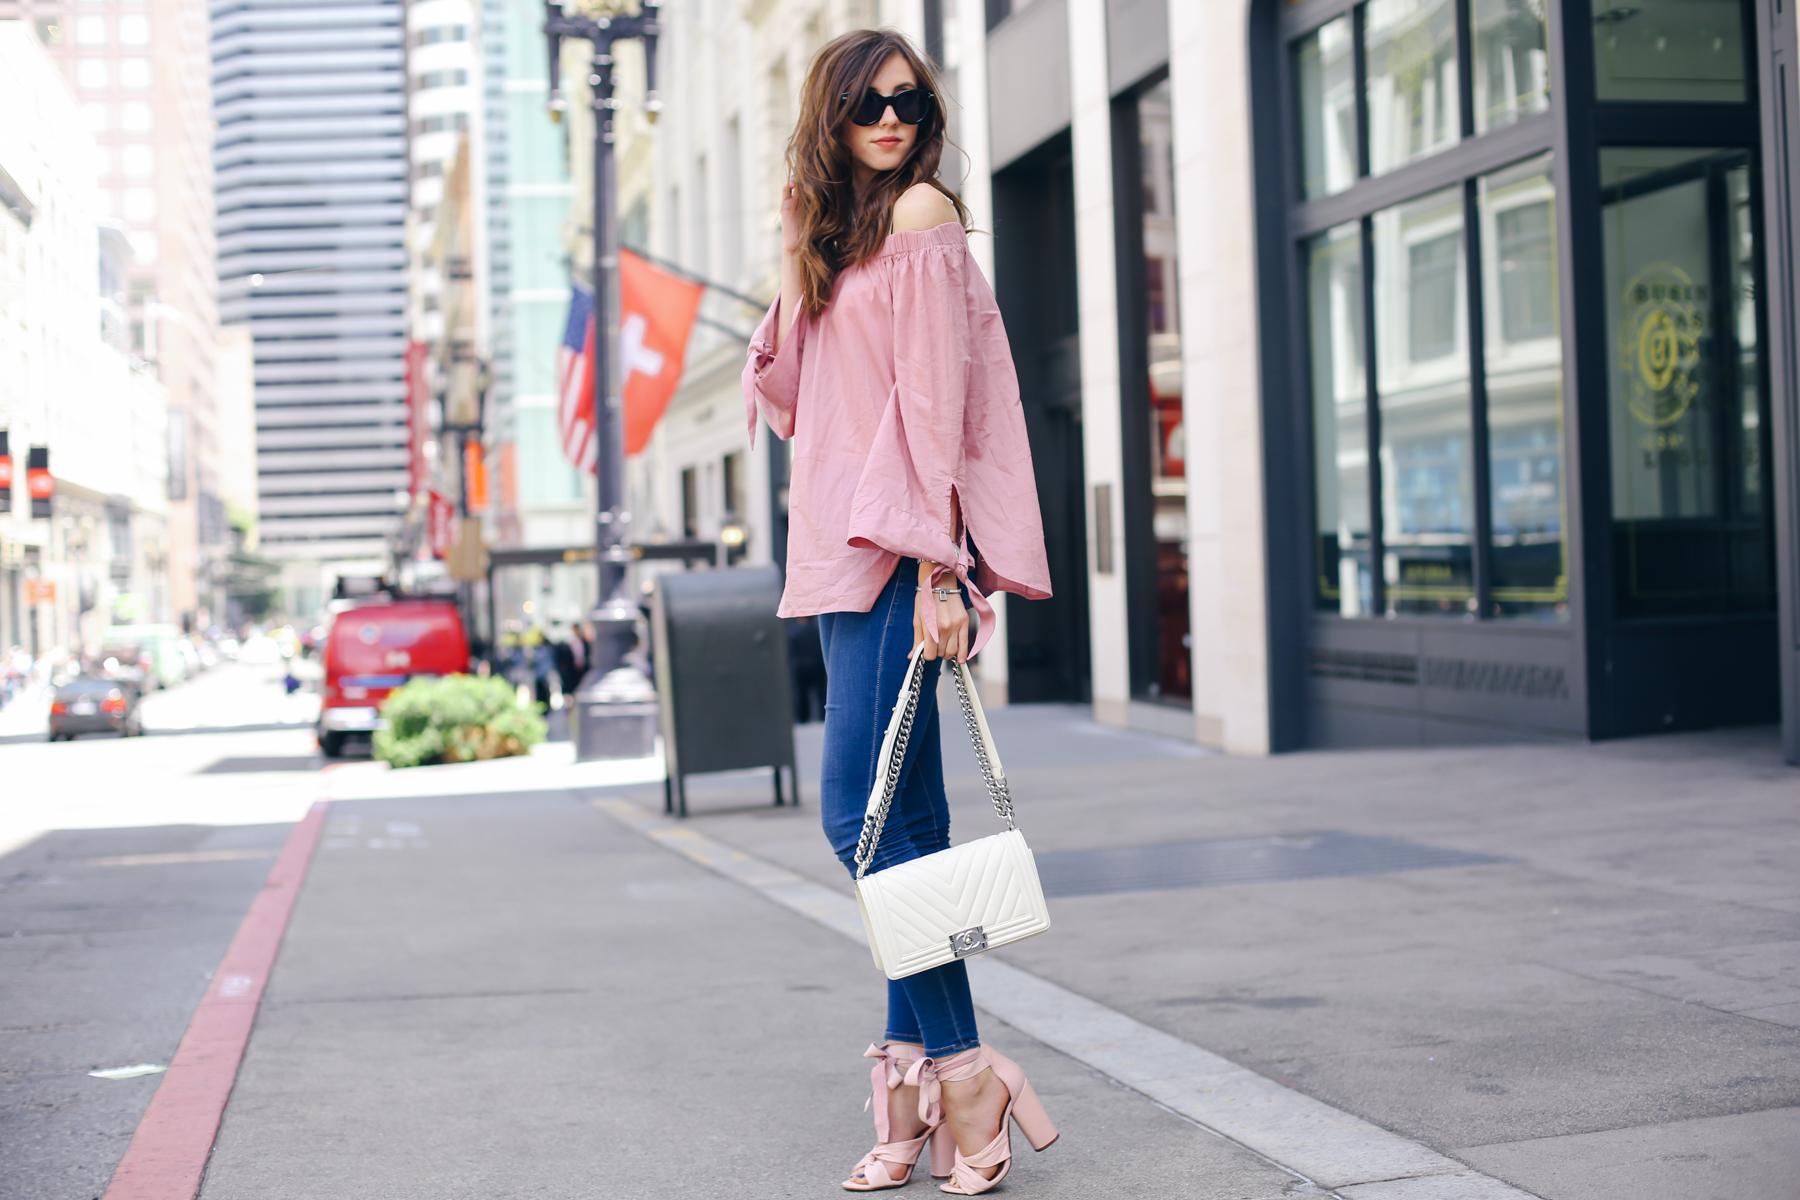 Barbora-Ondracova-FashioninmySoul-Fashion-Blogger-Photography-RyanbyRyanChua-7116